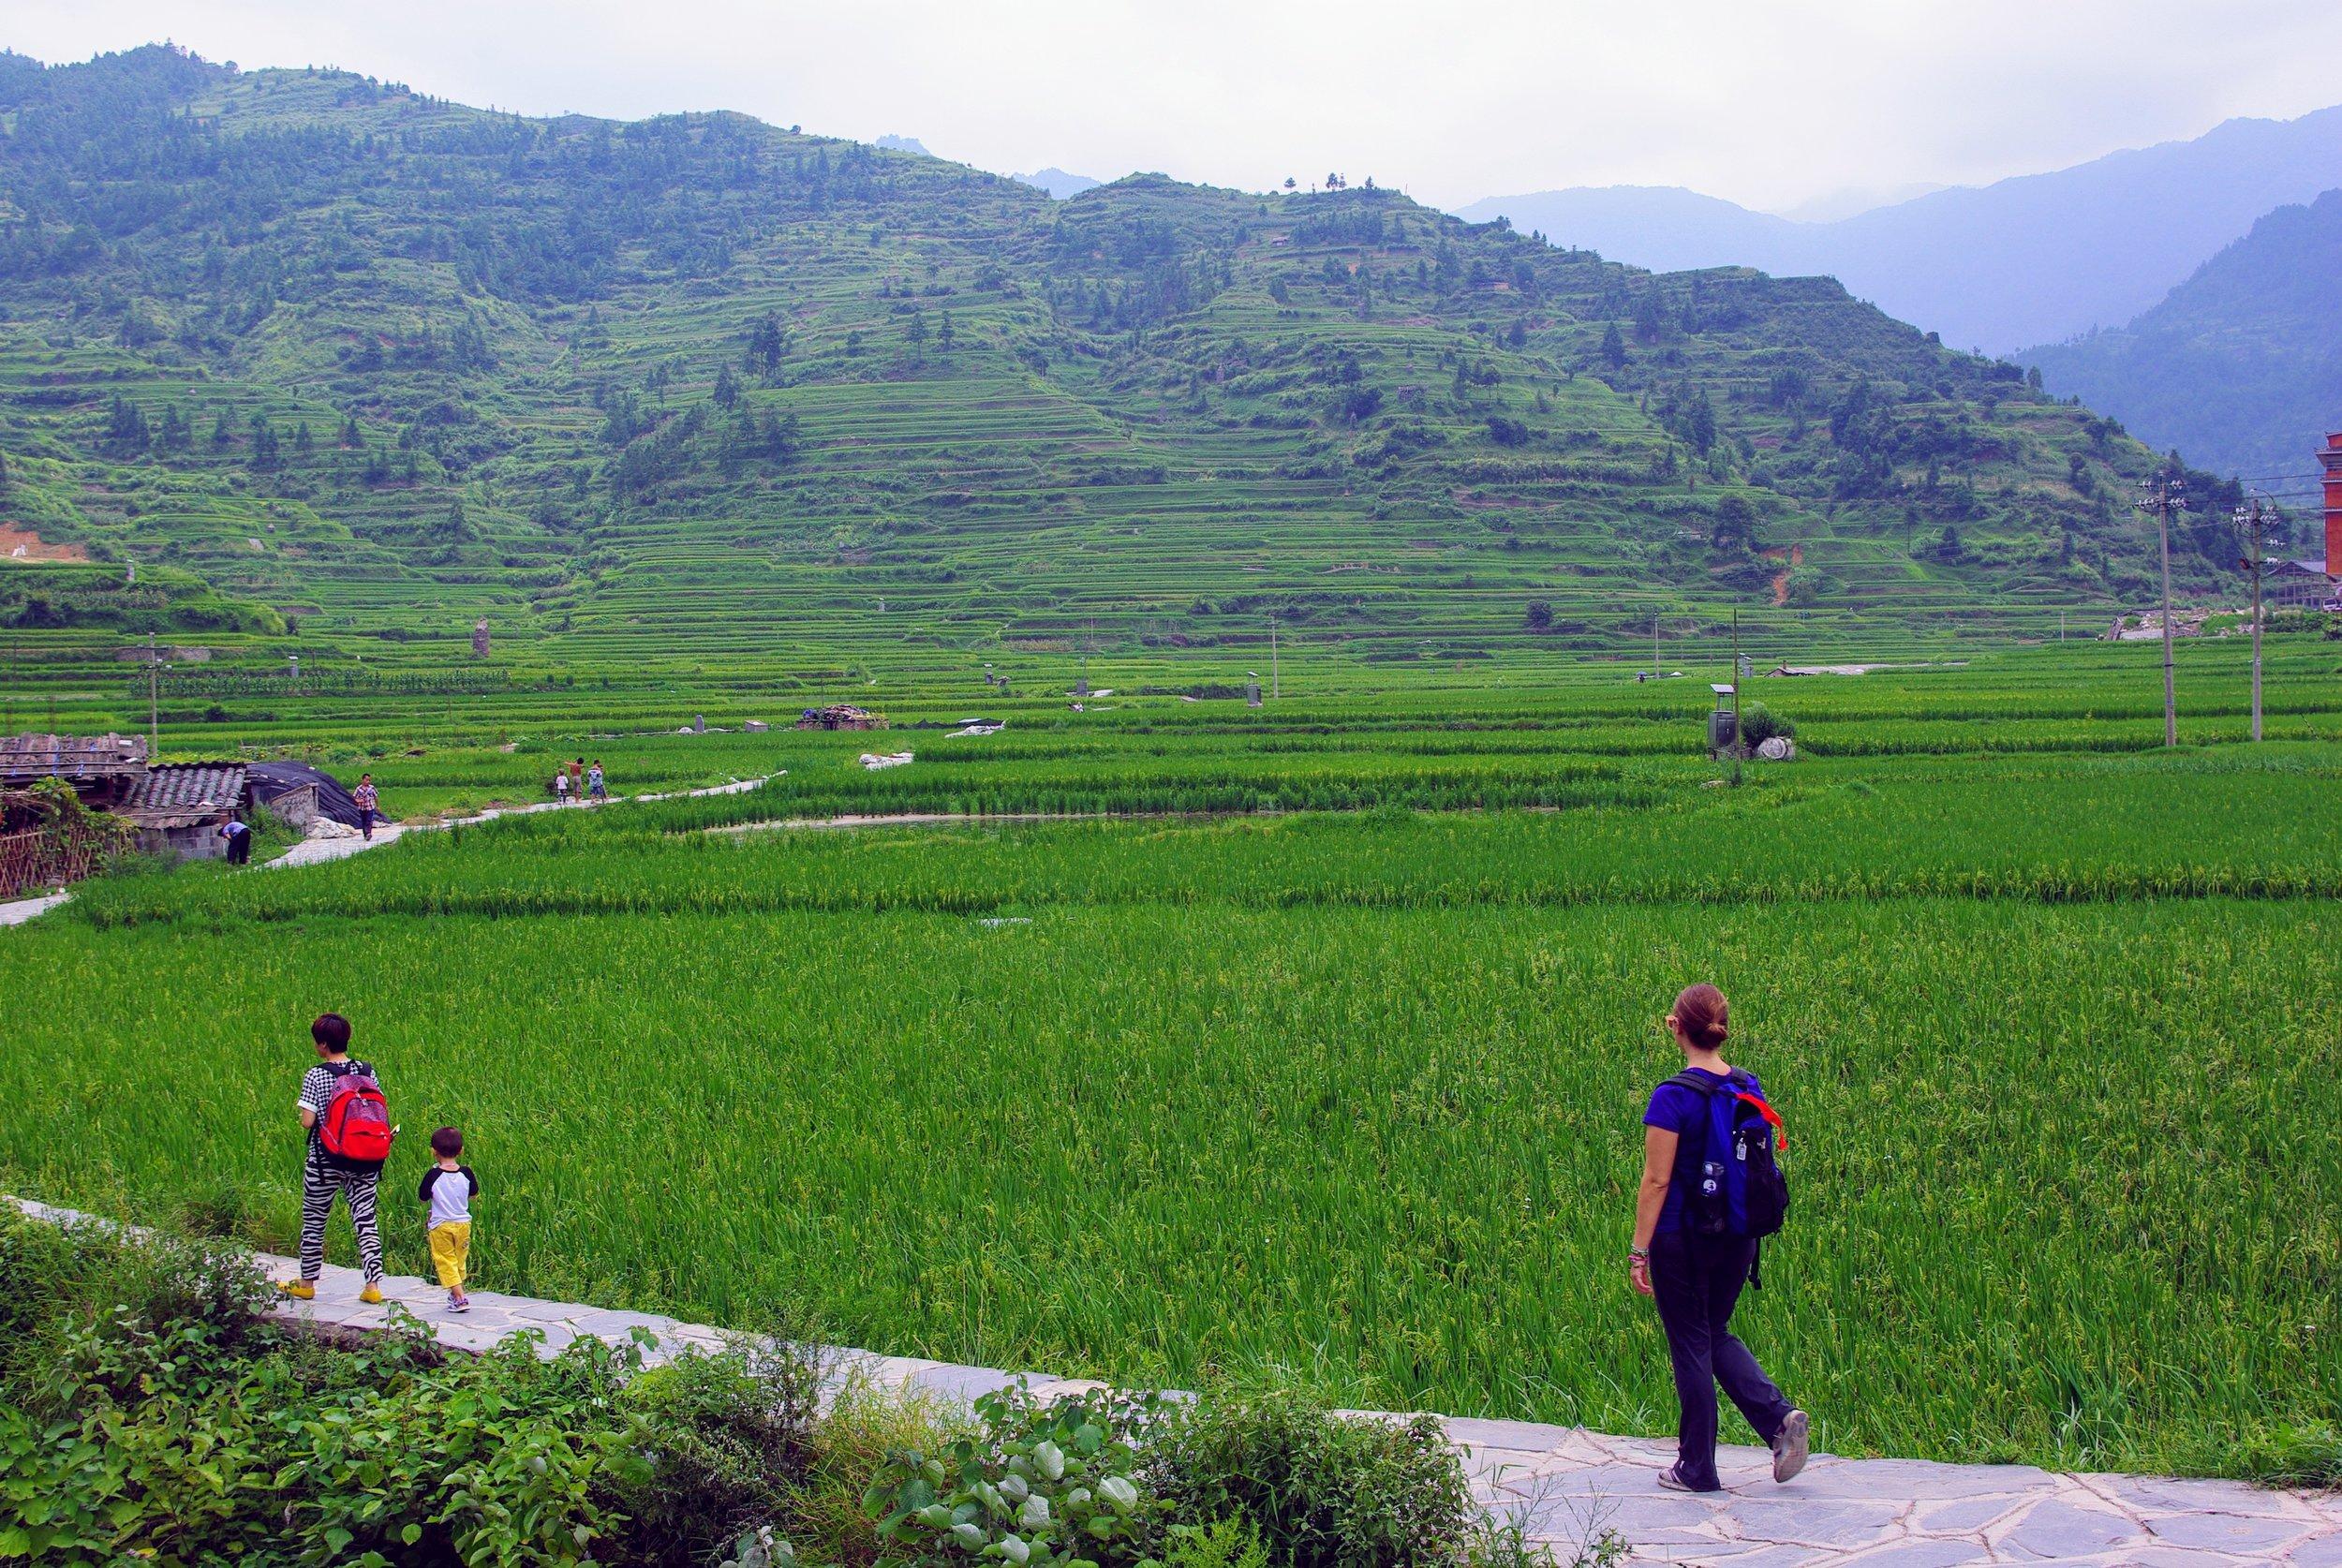 In Guizhou, China among the rice terraces.